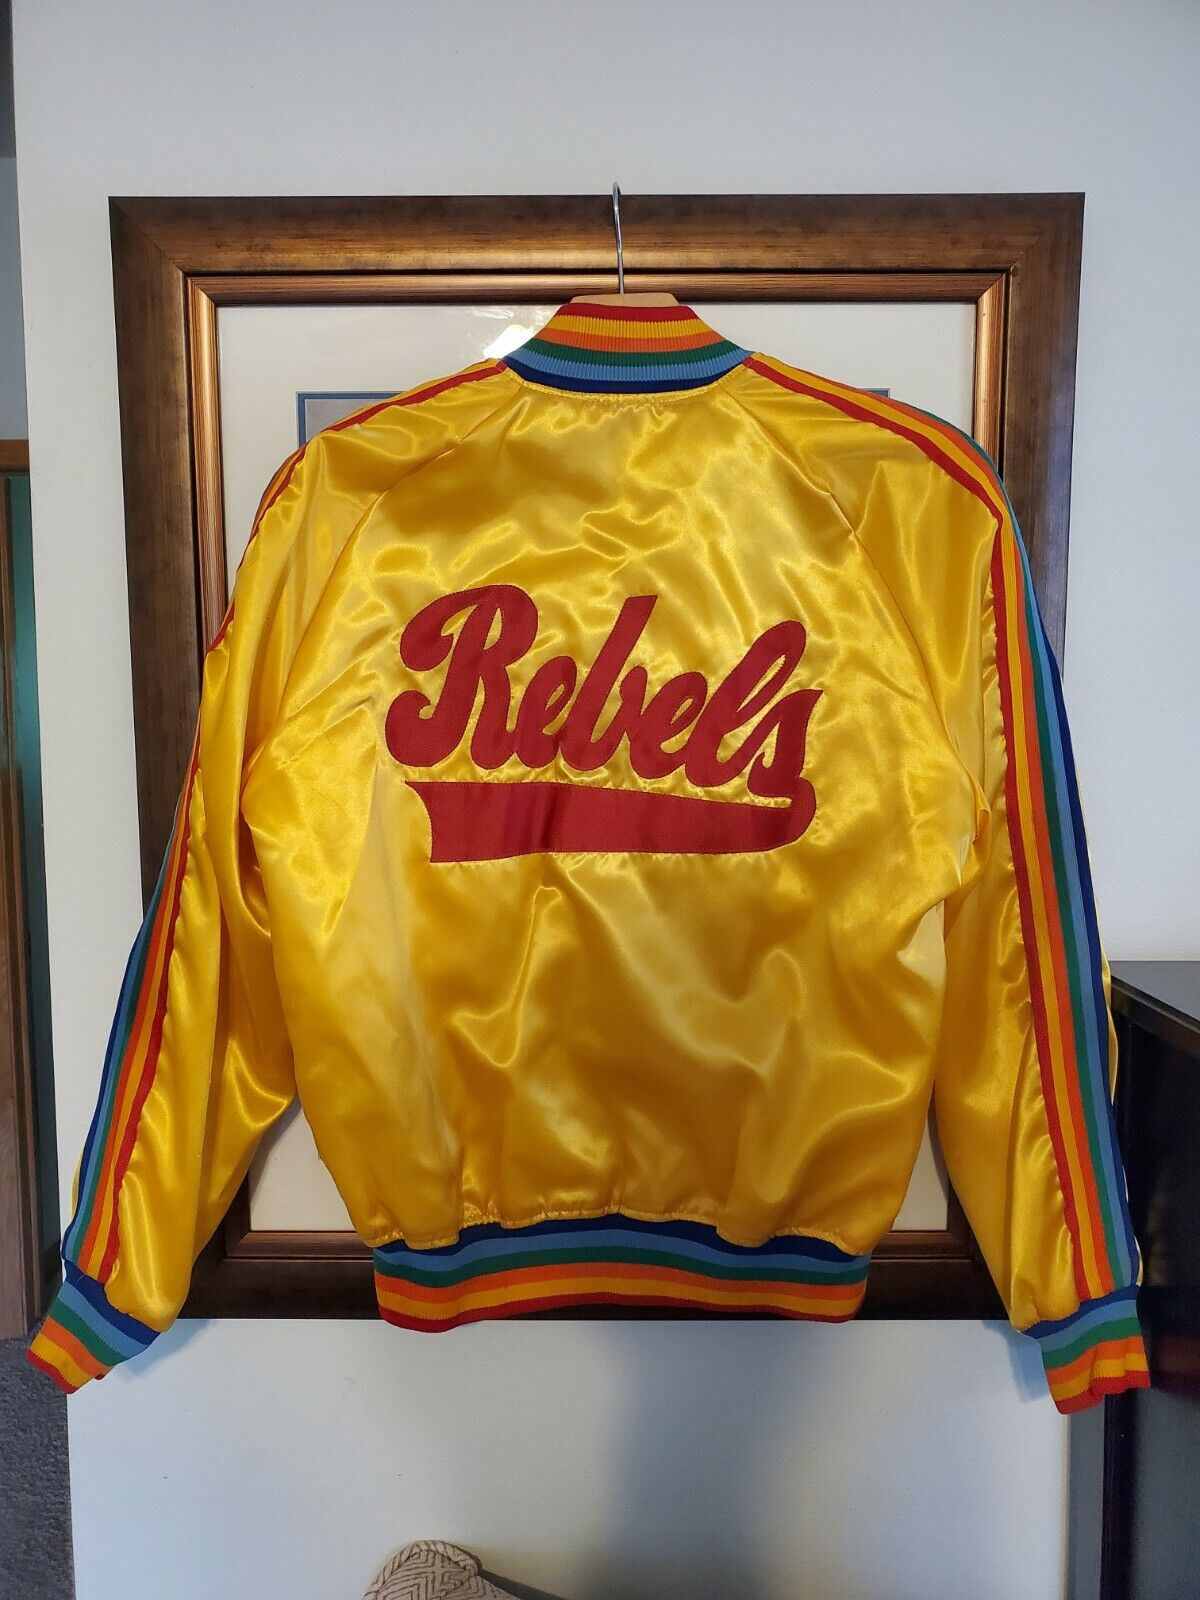 VTG 60s 70s Rebels Satin Rainbow Rock Tour Jacket - Large